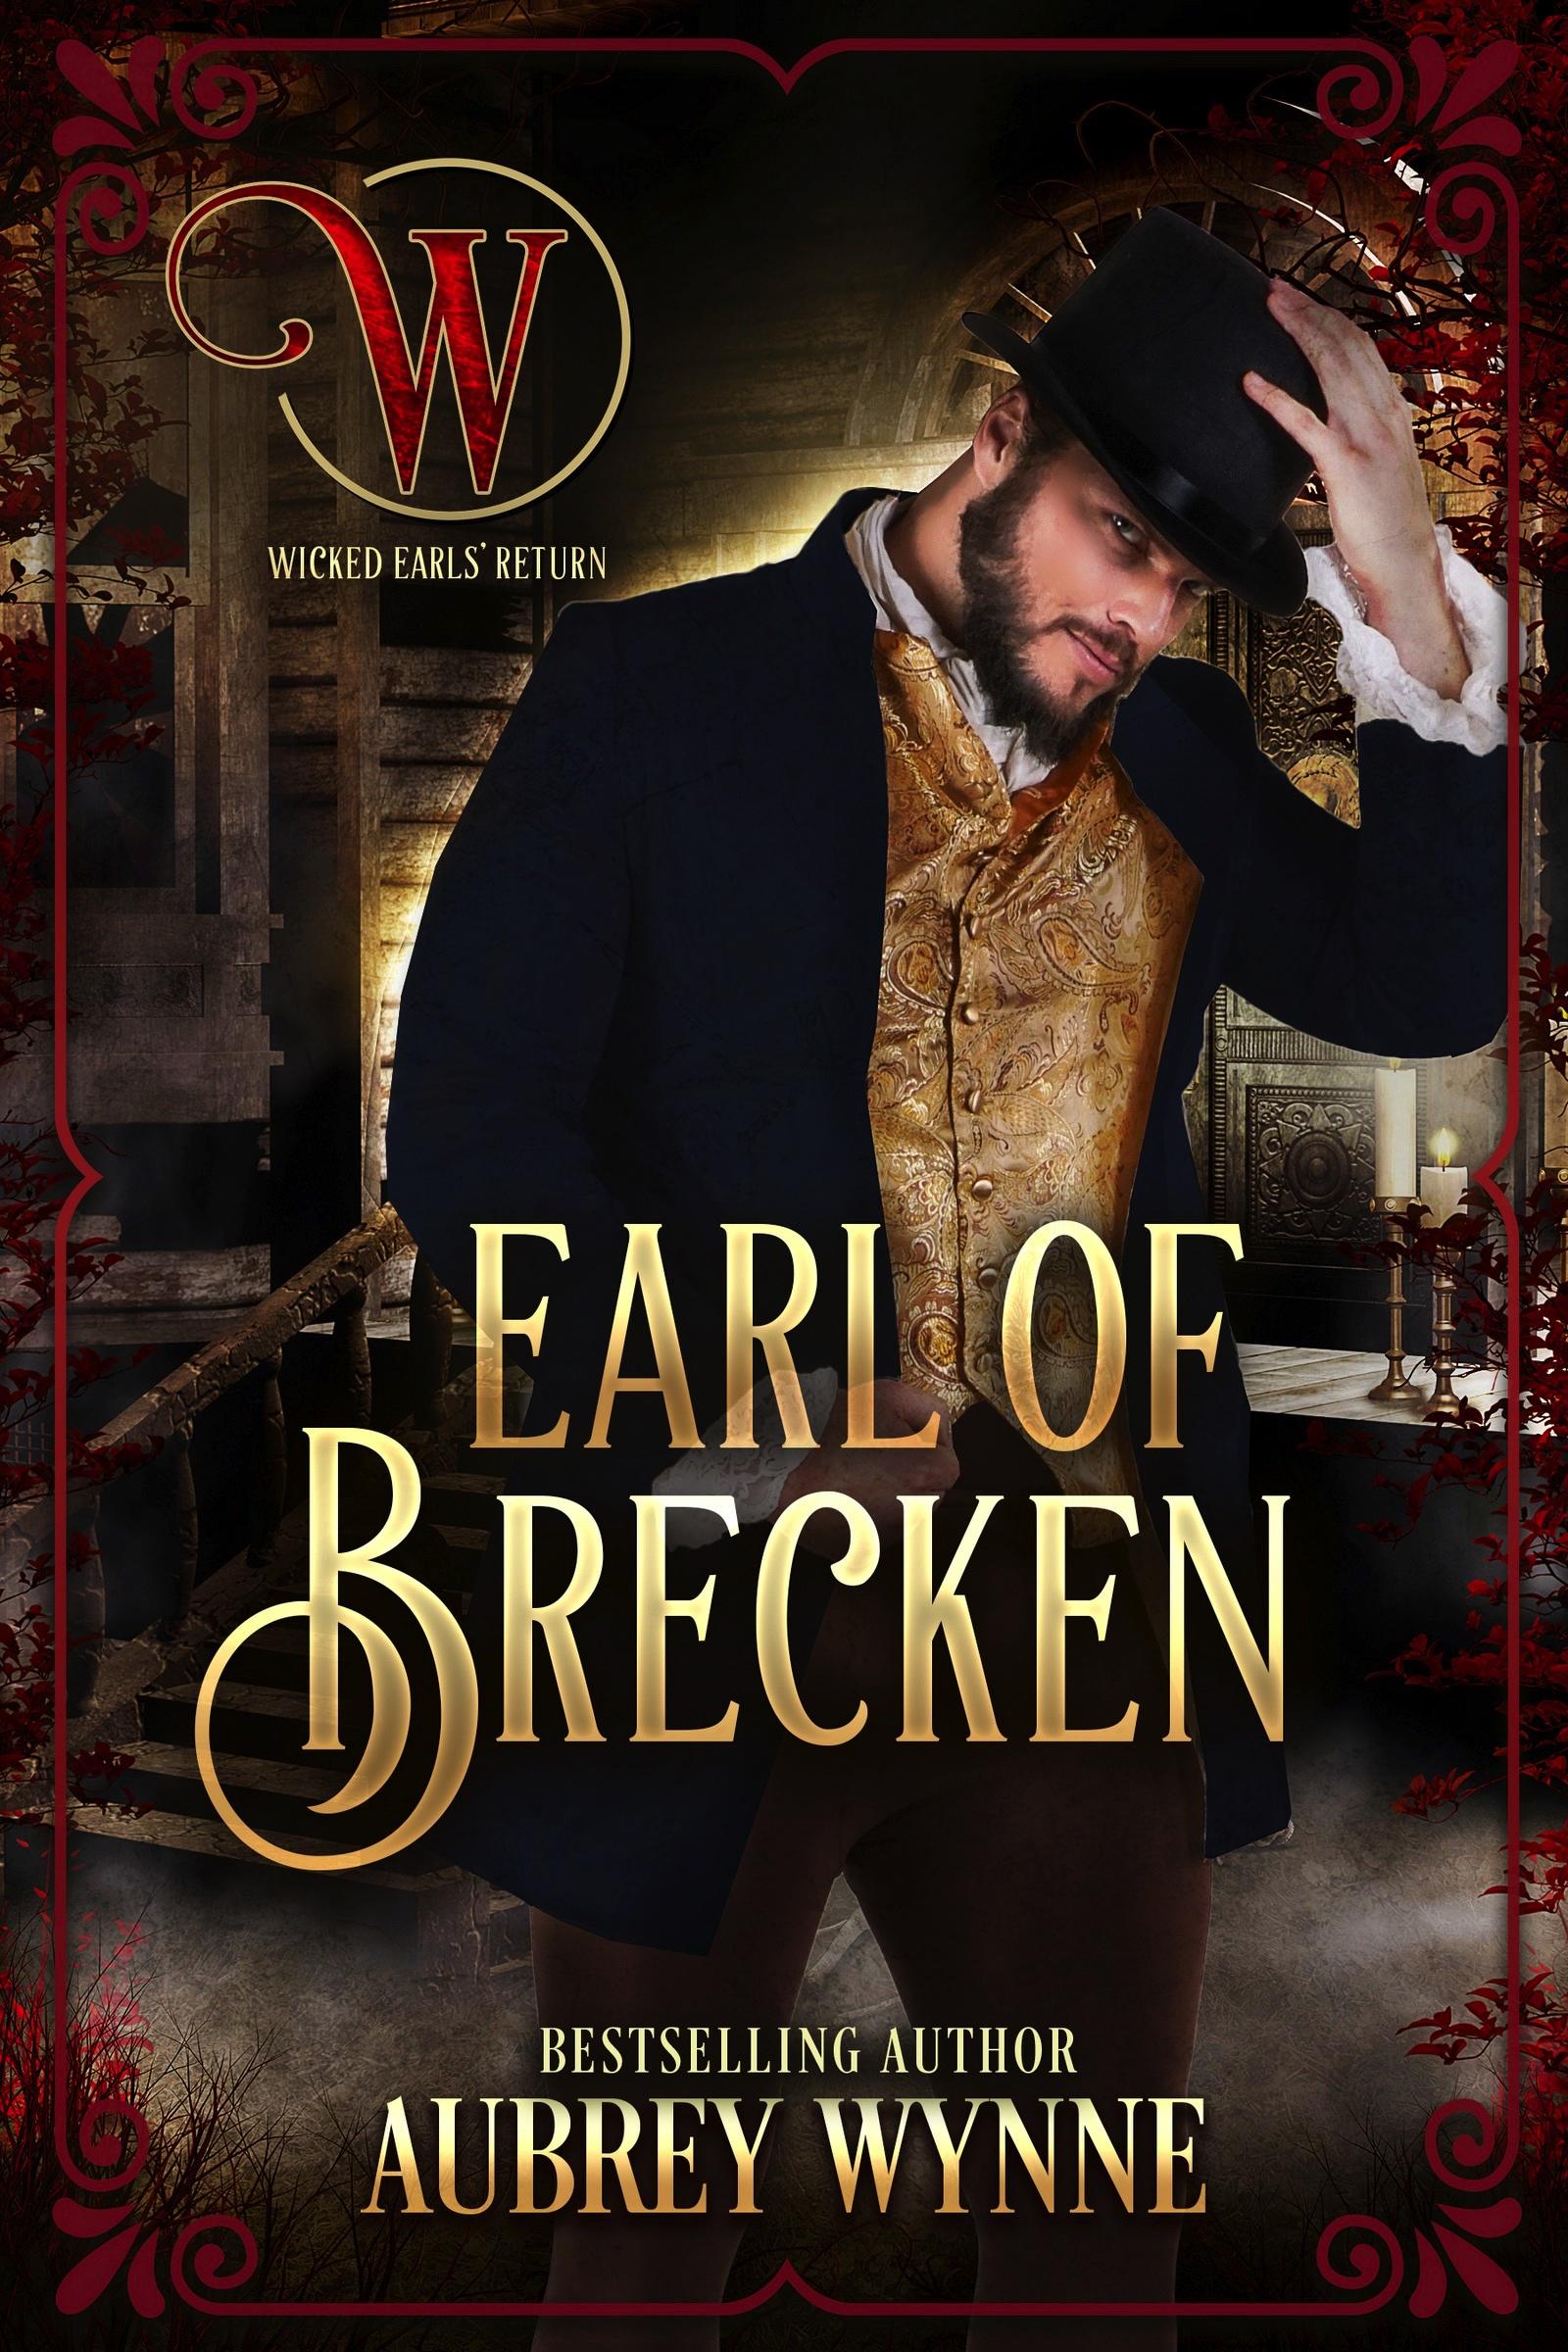 Earl-of-Brecken-Kindle